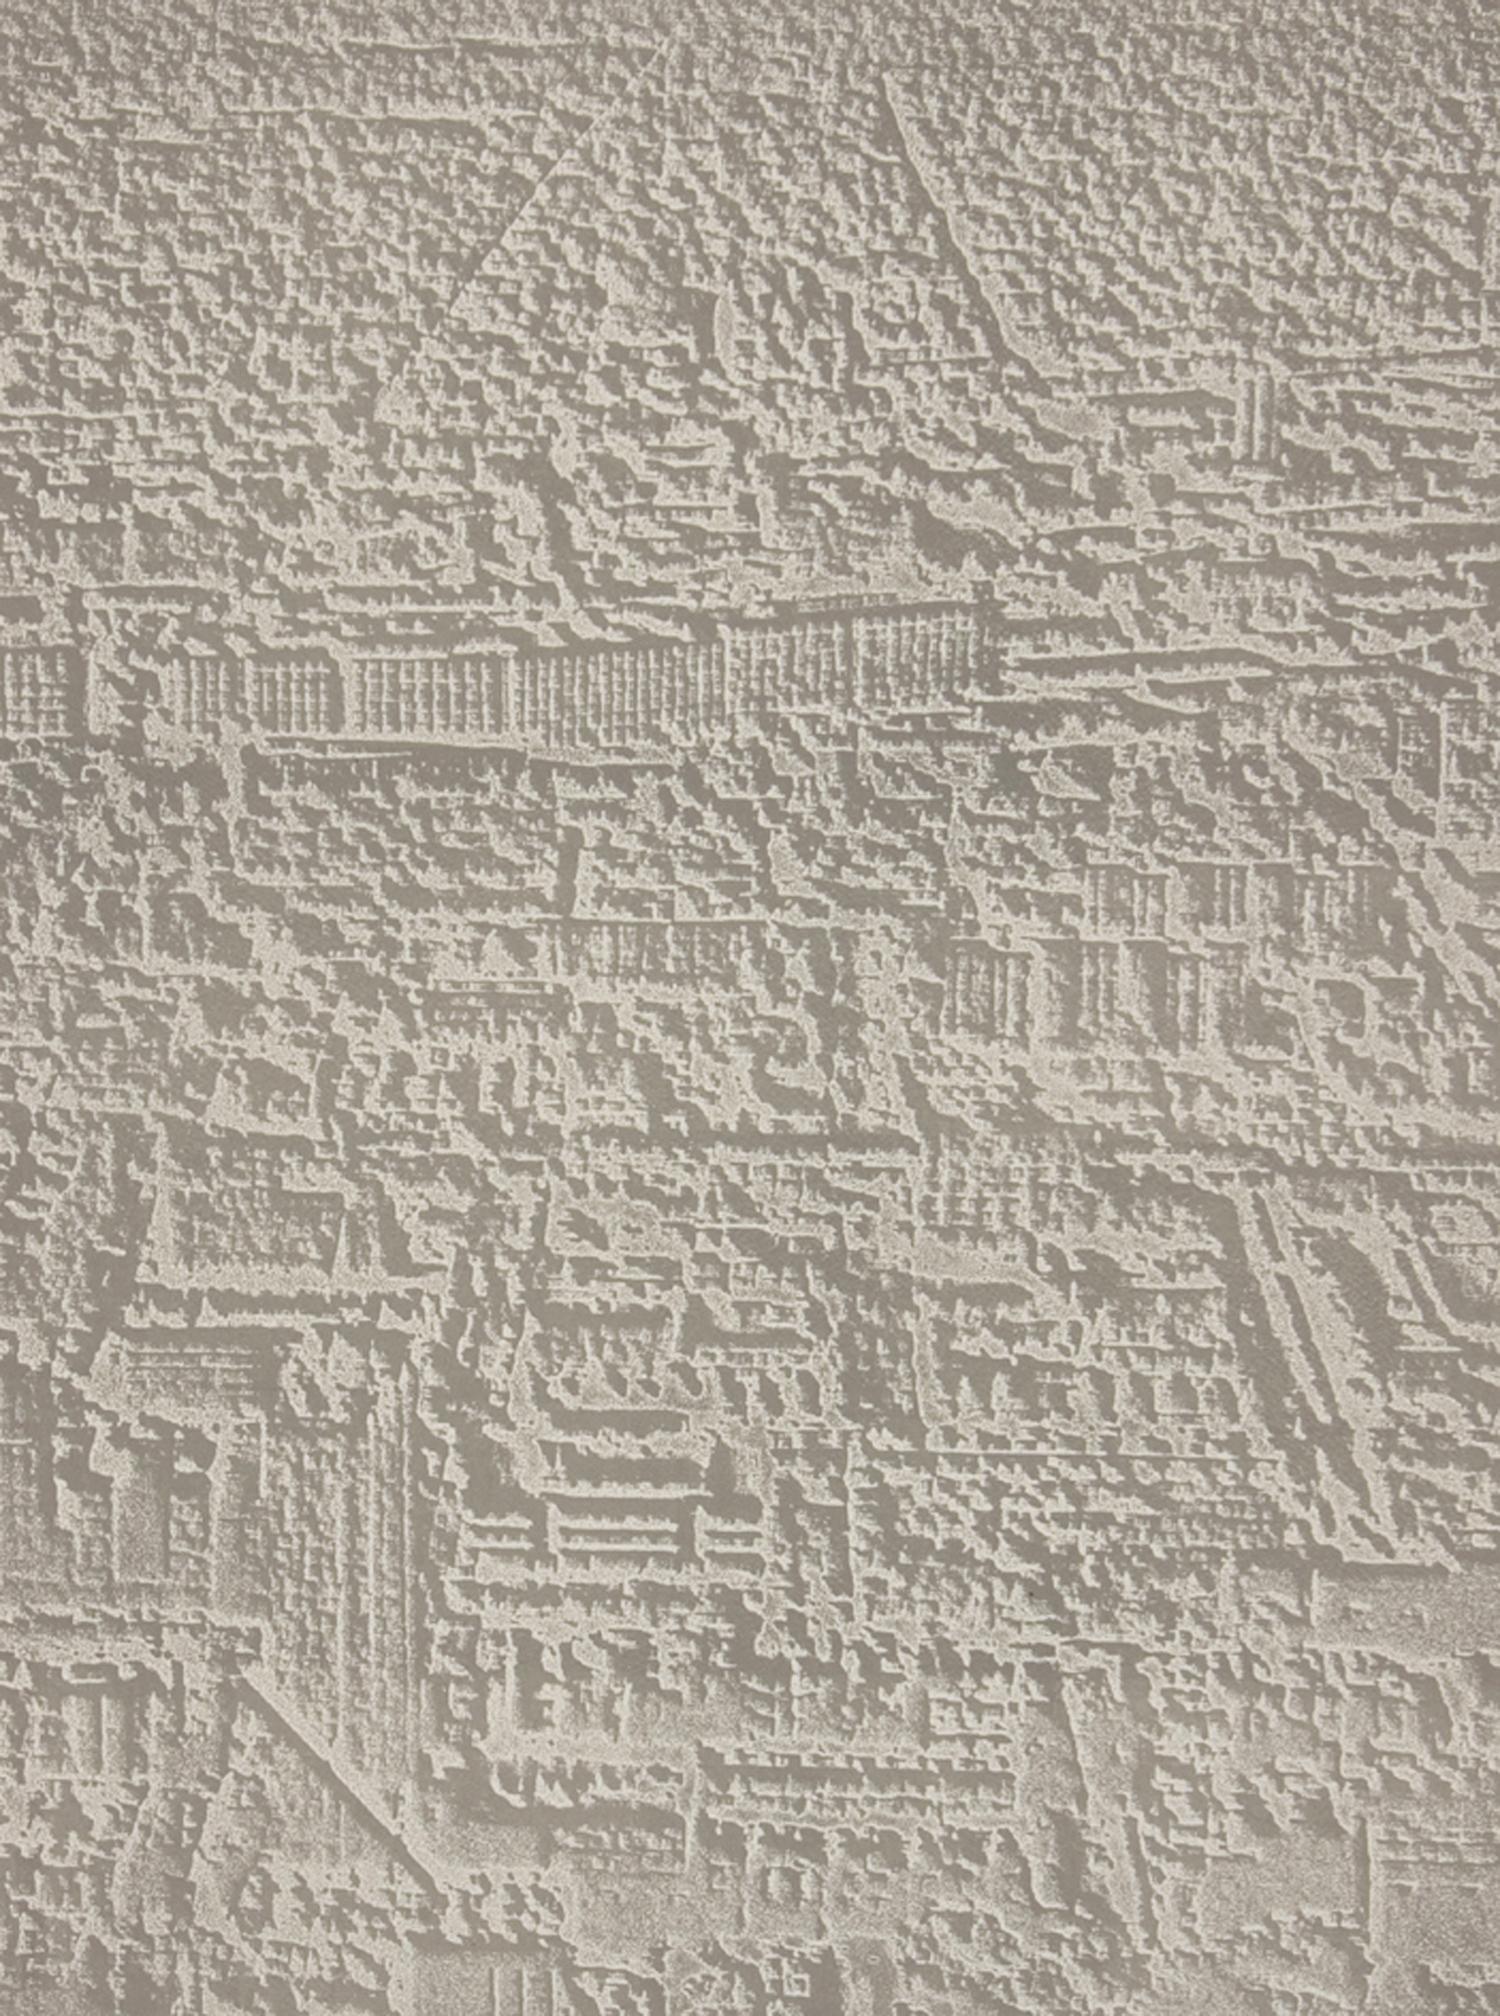 Jane D  ixon, Regeneration I (Chicago)    Date:  2007   Size (cm - unframed):    56 x 42cm   Technique:  Etching   Materials:  Moulin du Gue 270gsm   Edition size:  20   Publisher:  The Print Studio   Copyright:  The Artist    P.O.A.